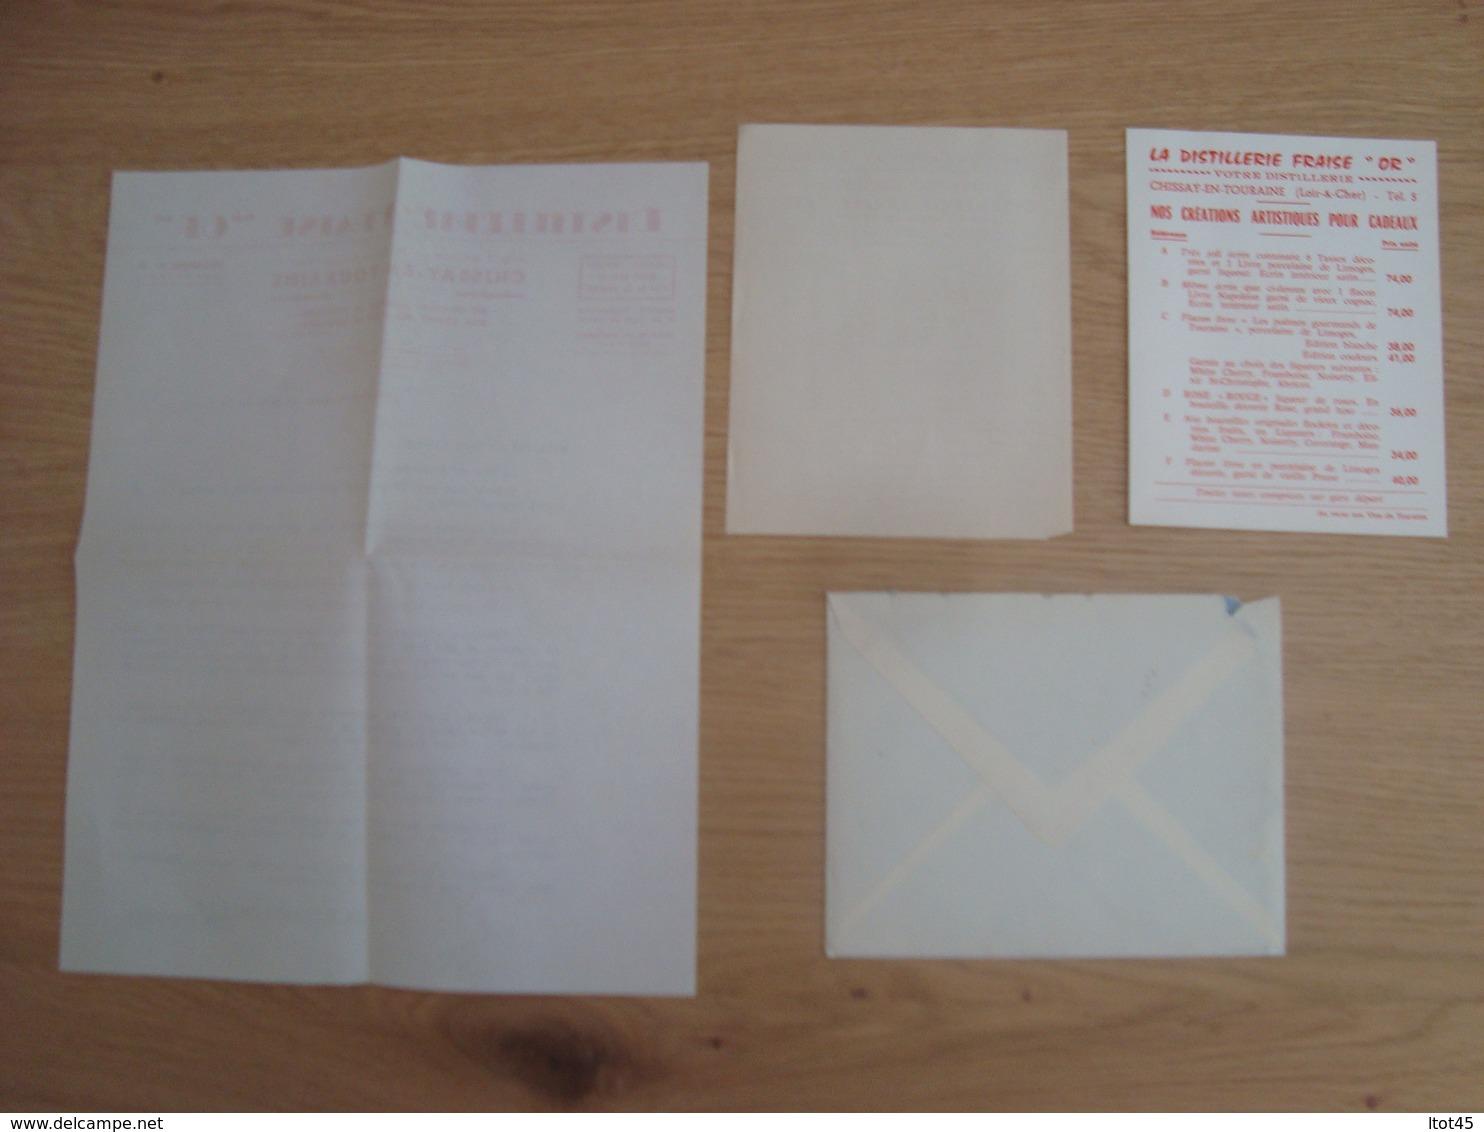 "ENVELOPPE + DOCUMENT DISTILLERIE FRAISE ""OR"" CHISSAY-EN-TOURAINE - Marcophilie (Lettres)"